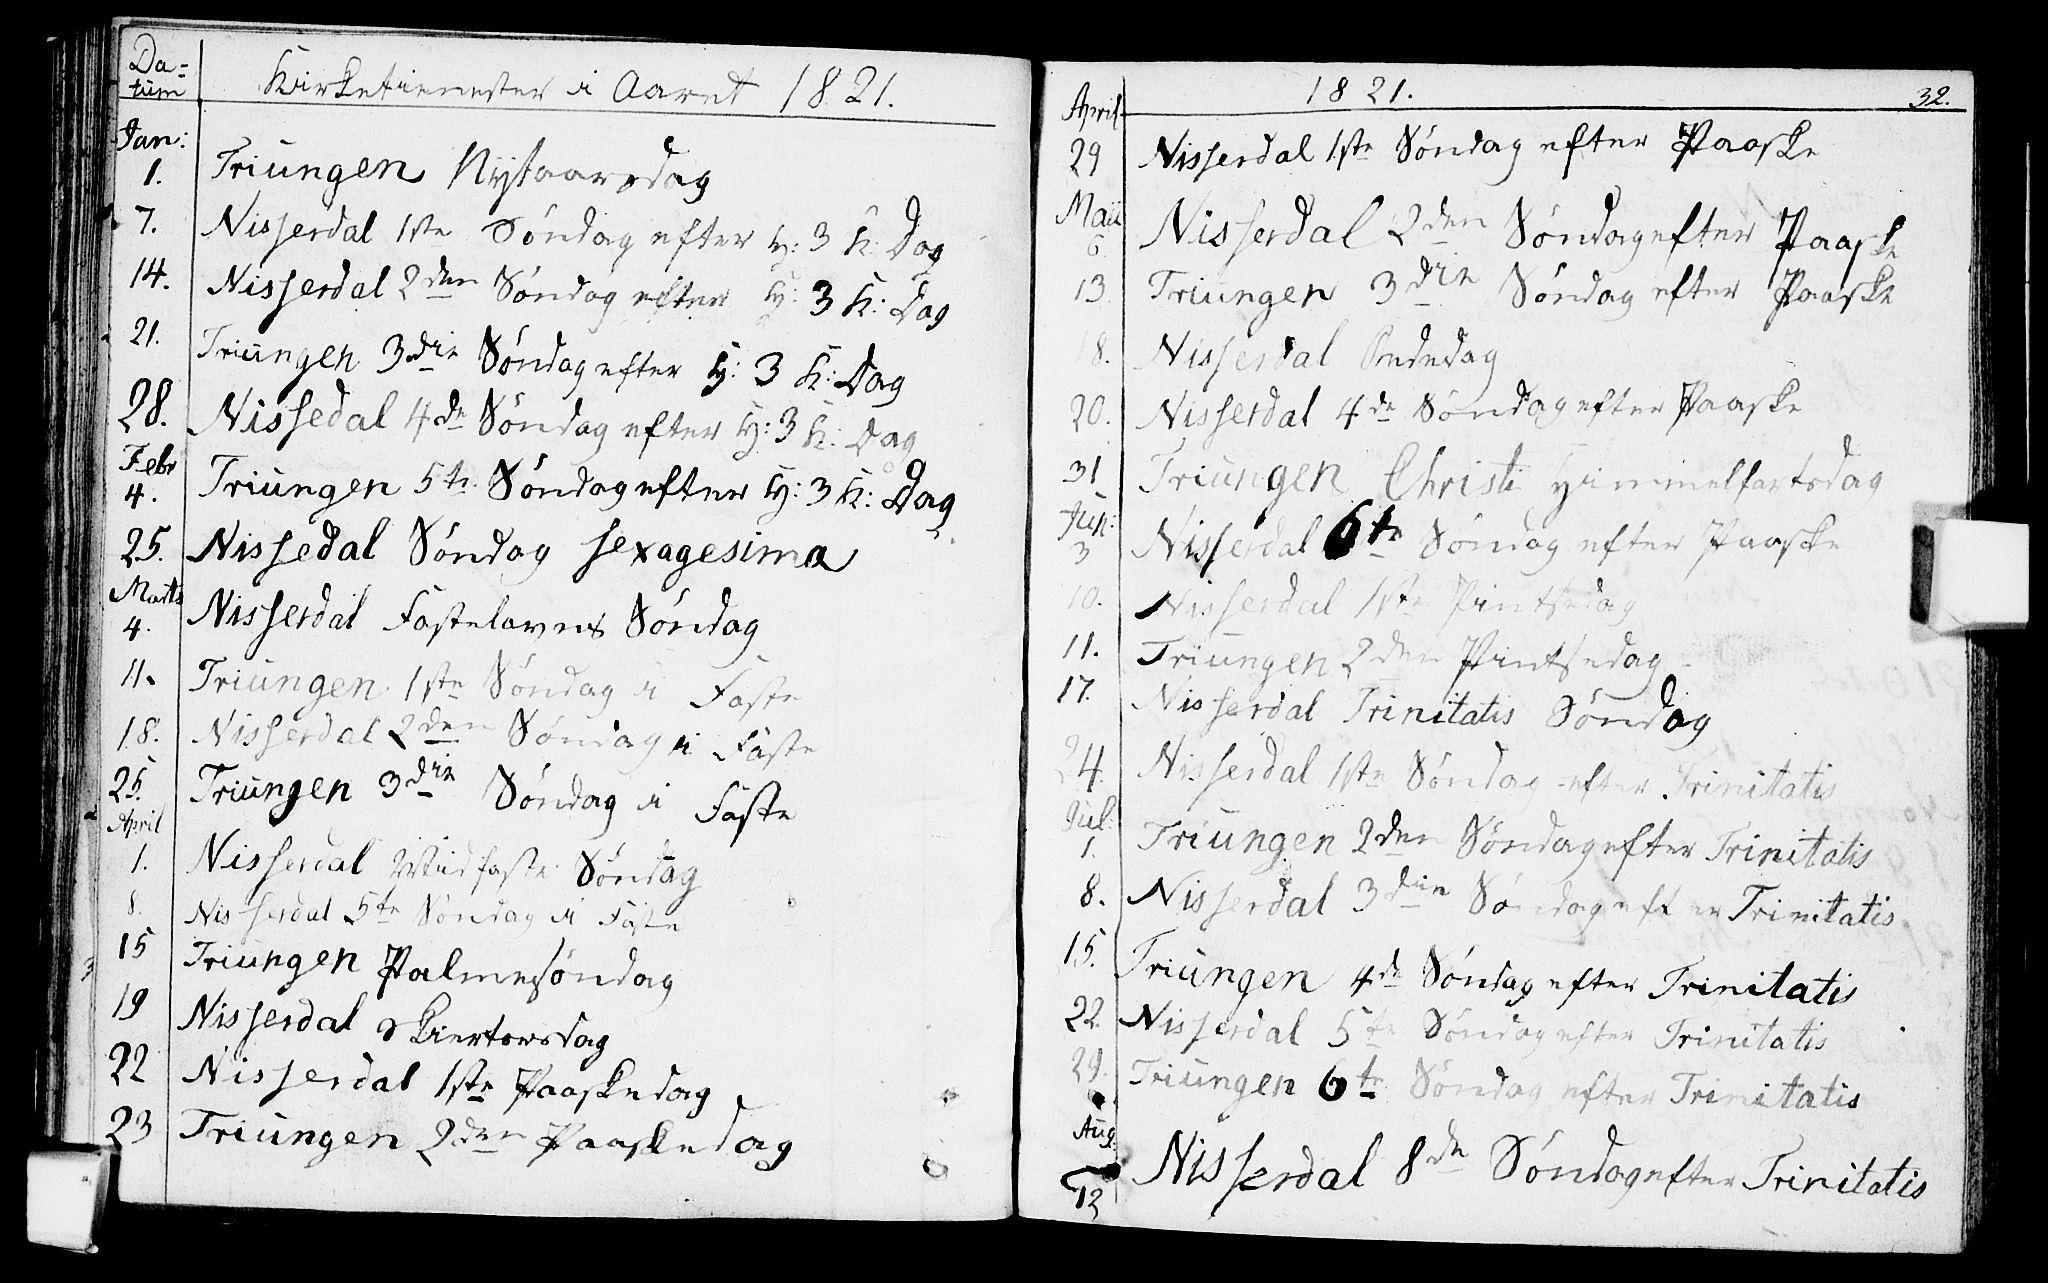 SAKO, Nissedal kirkebøker, F/Fa/L0001: Ministerialbok nr. I 1, 1811-1814, s. 32